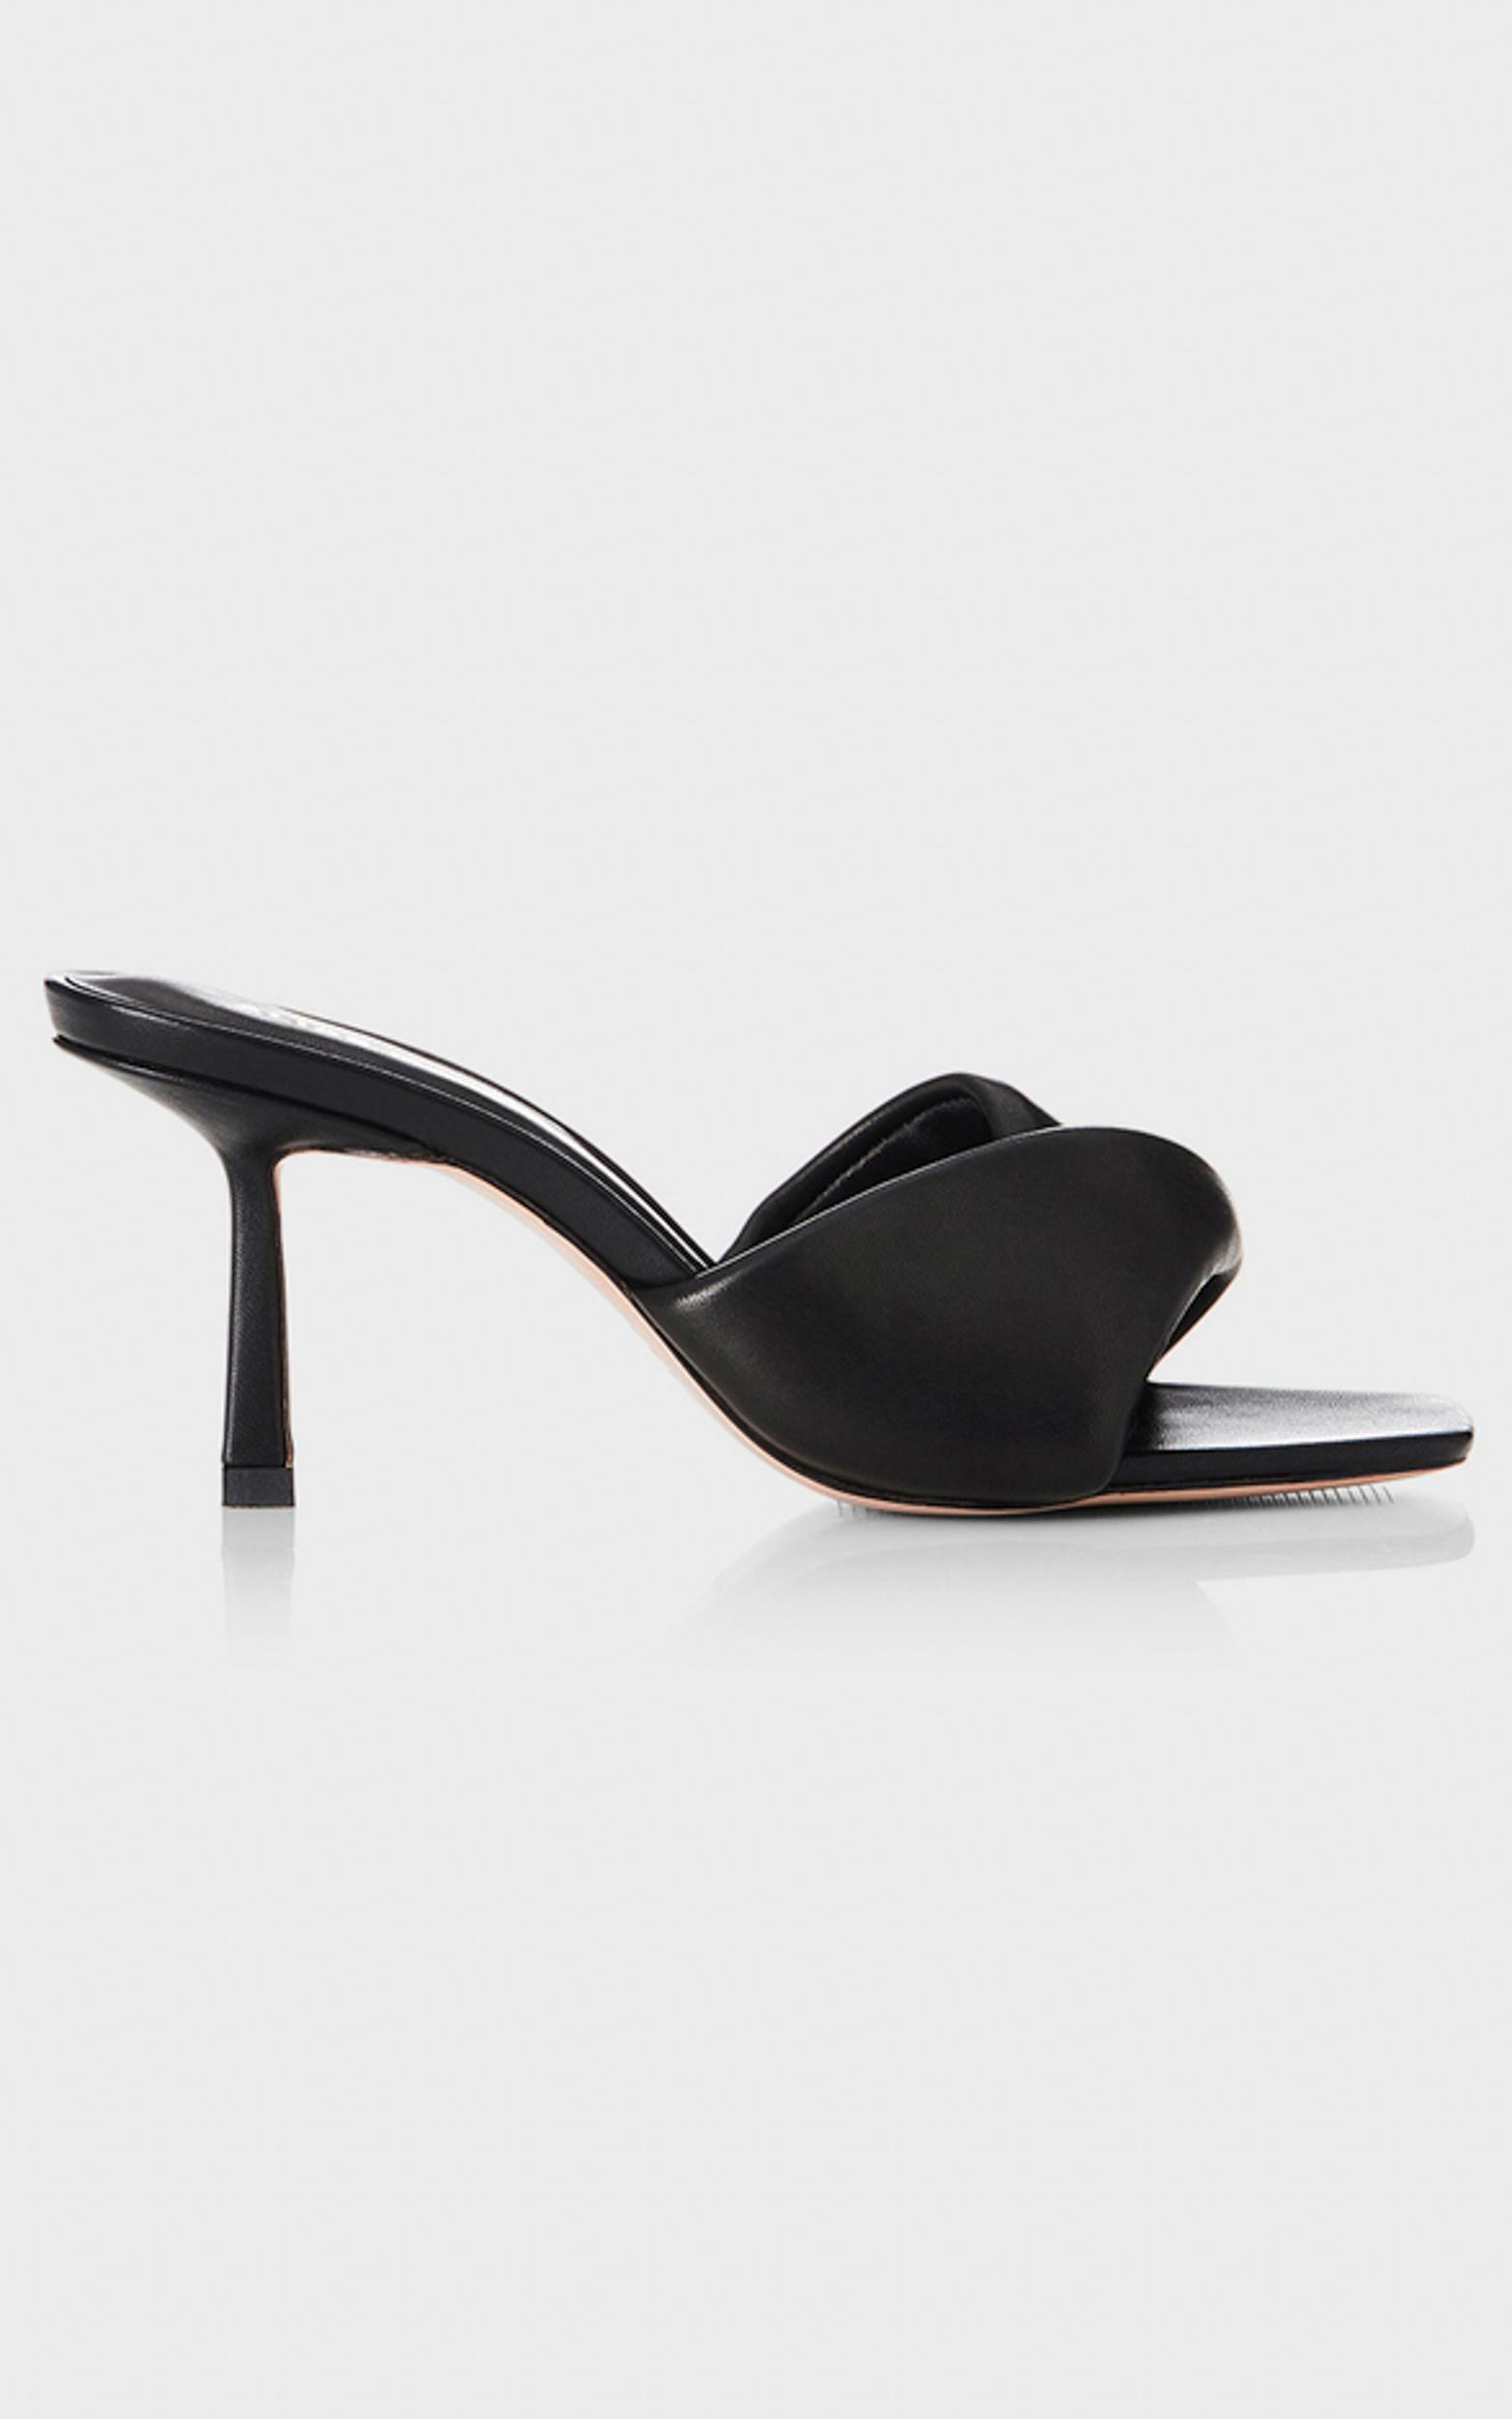 Alias Mae - Liv Heels in Black Leather - 5.5, Black, hi-res image number null